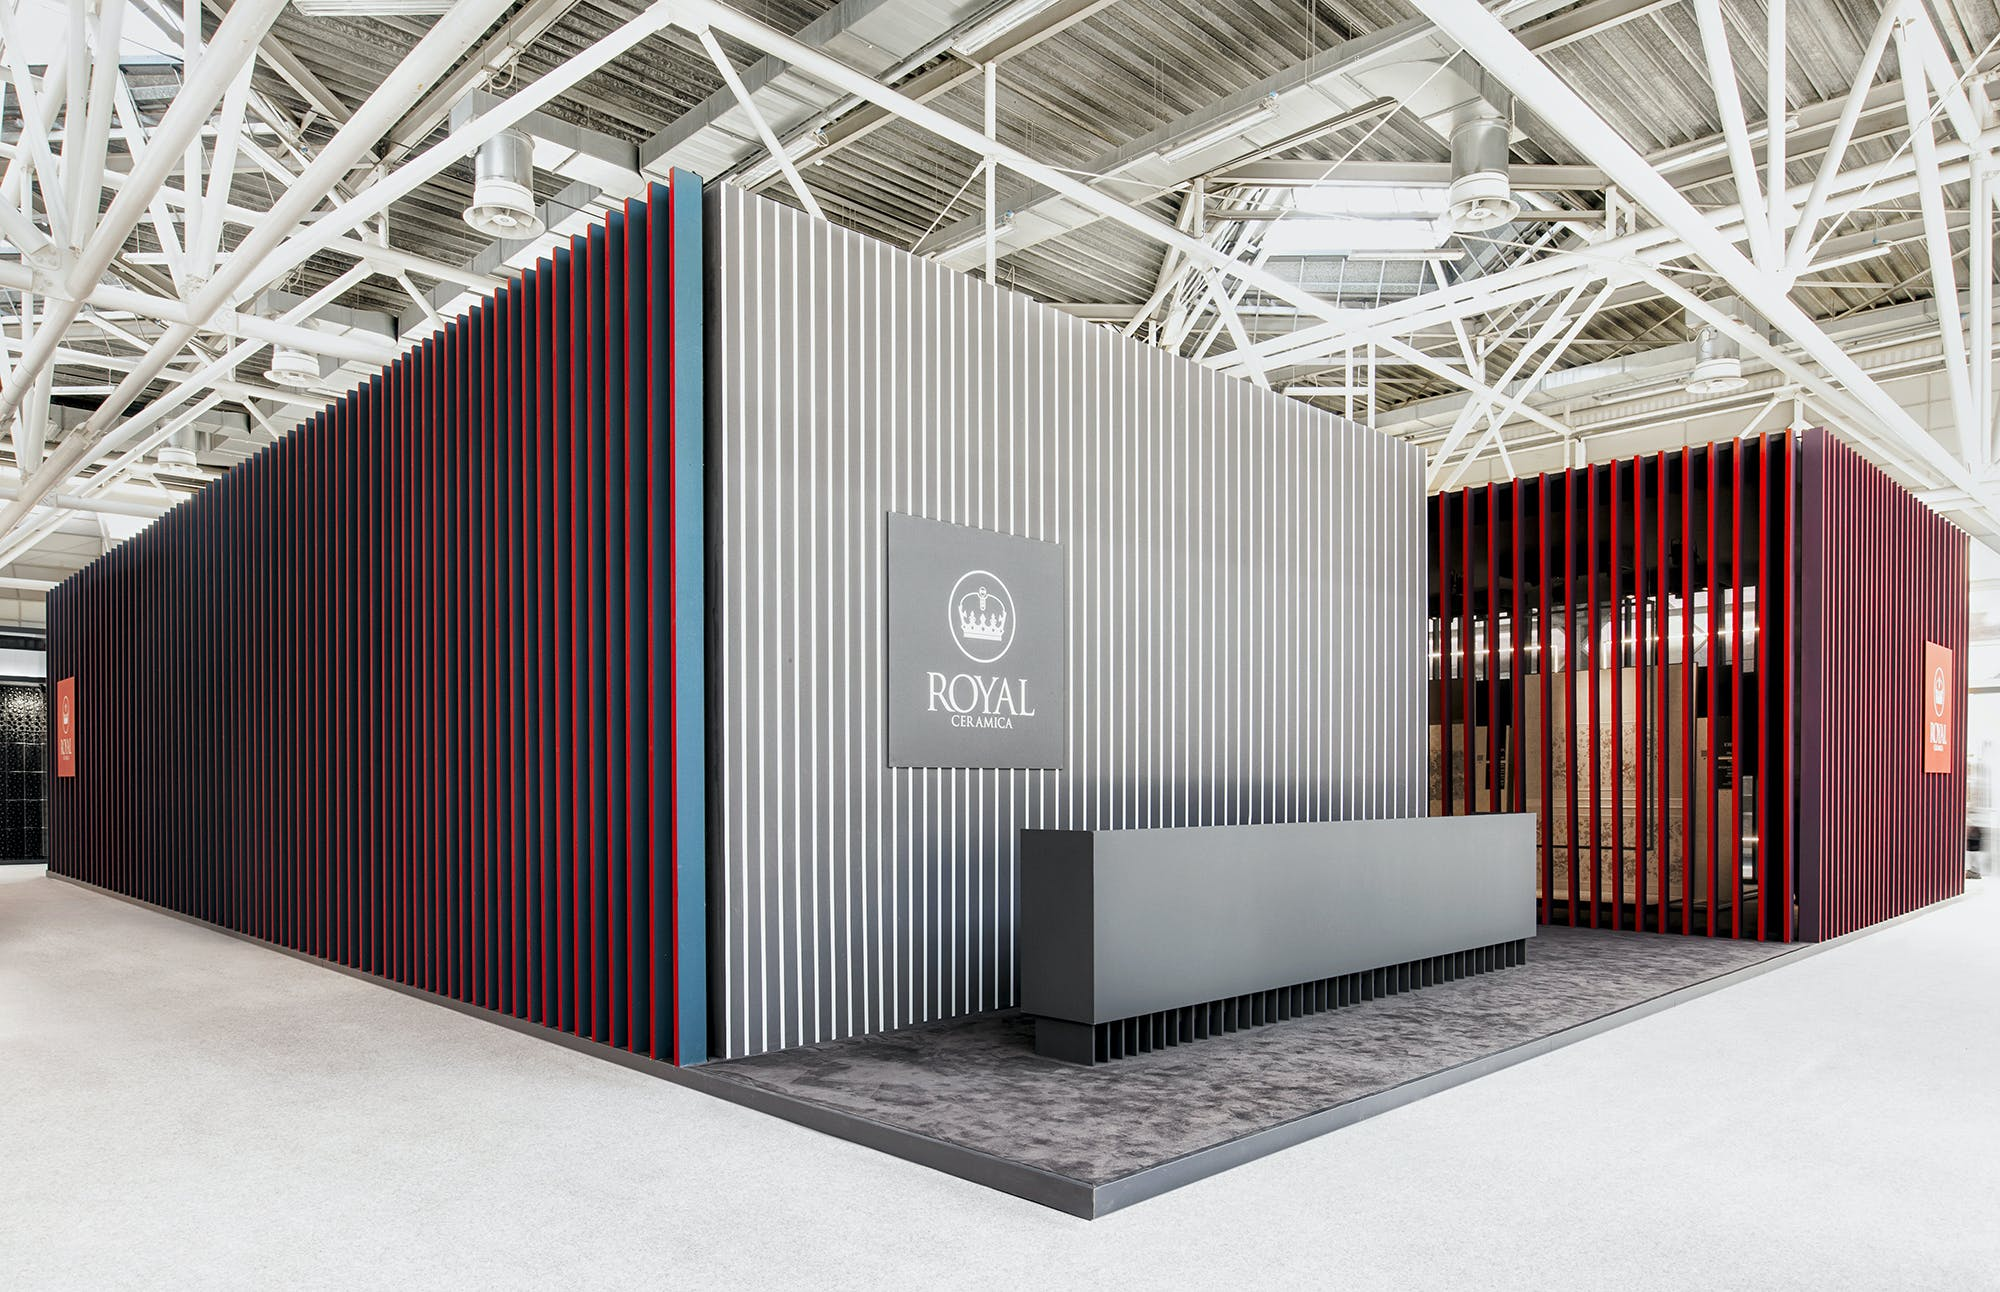 Framing | RC pavillion @ Cersaie 2014 | | Paolo Cesaretti Architetto ...